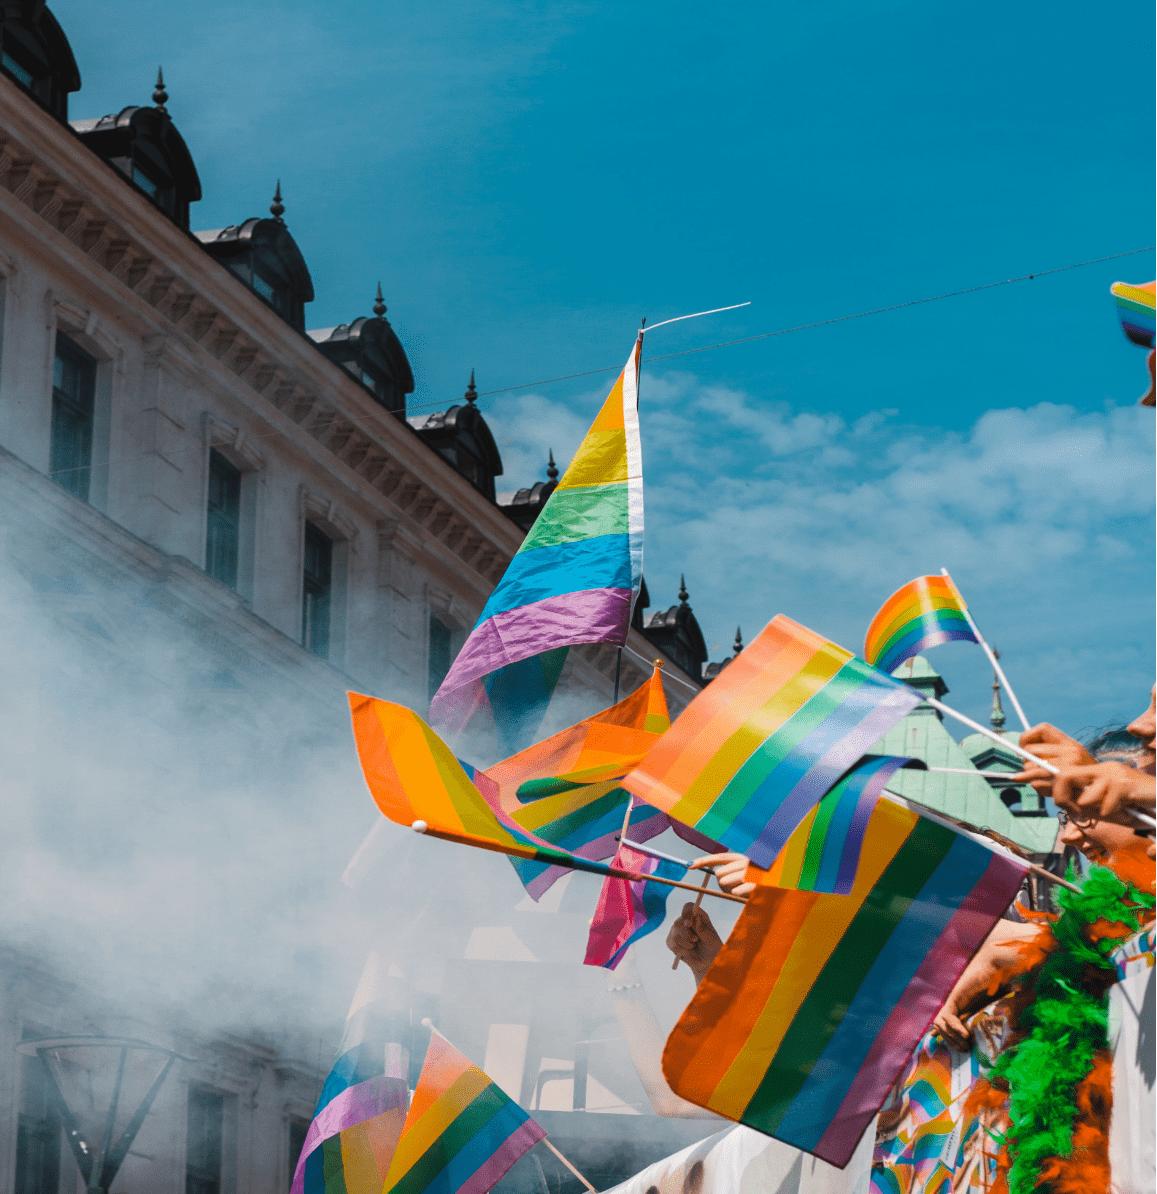 Georgian transgender man denied legal gender recognition lodges application at European Court of Human Rights